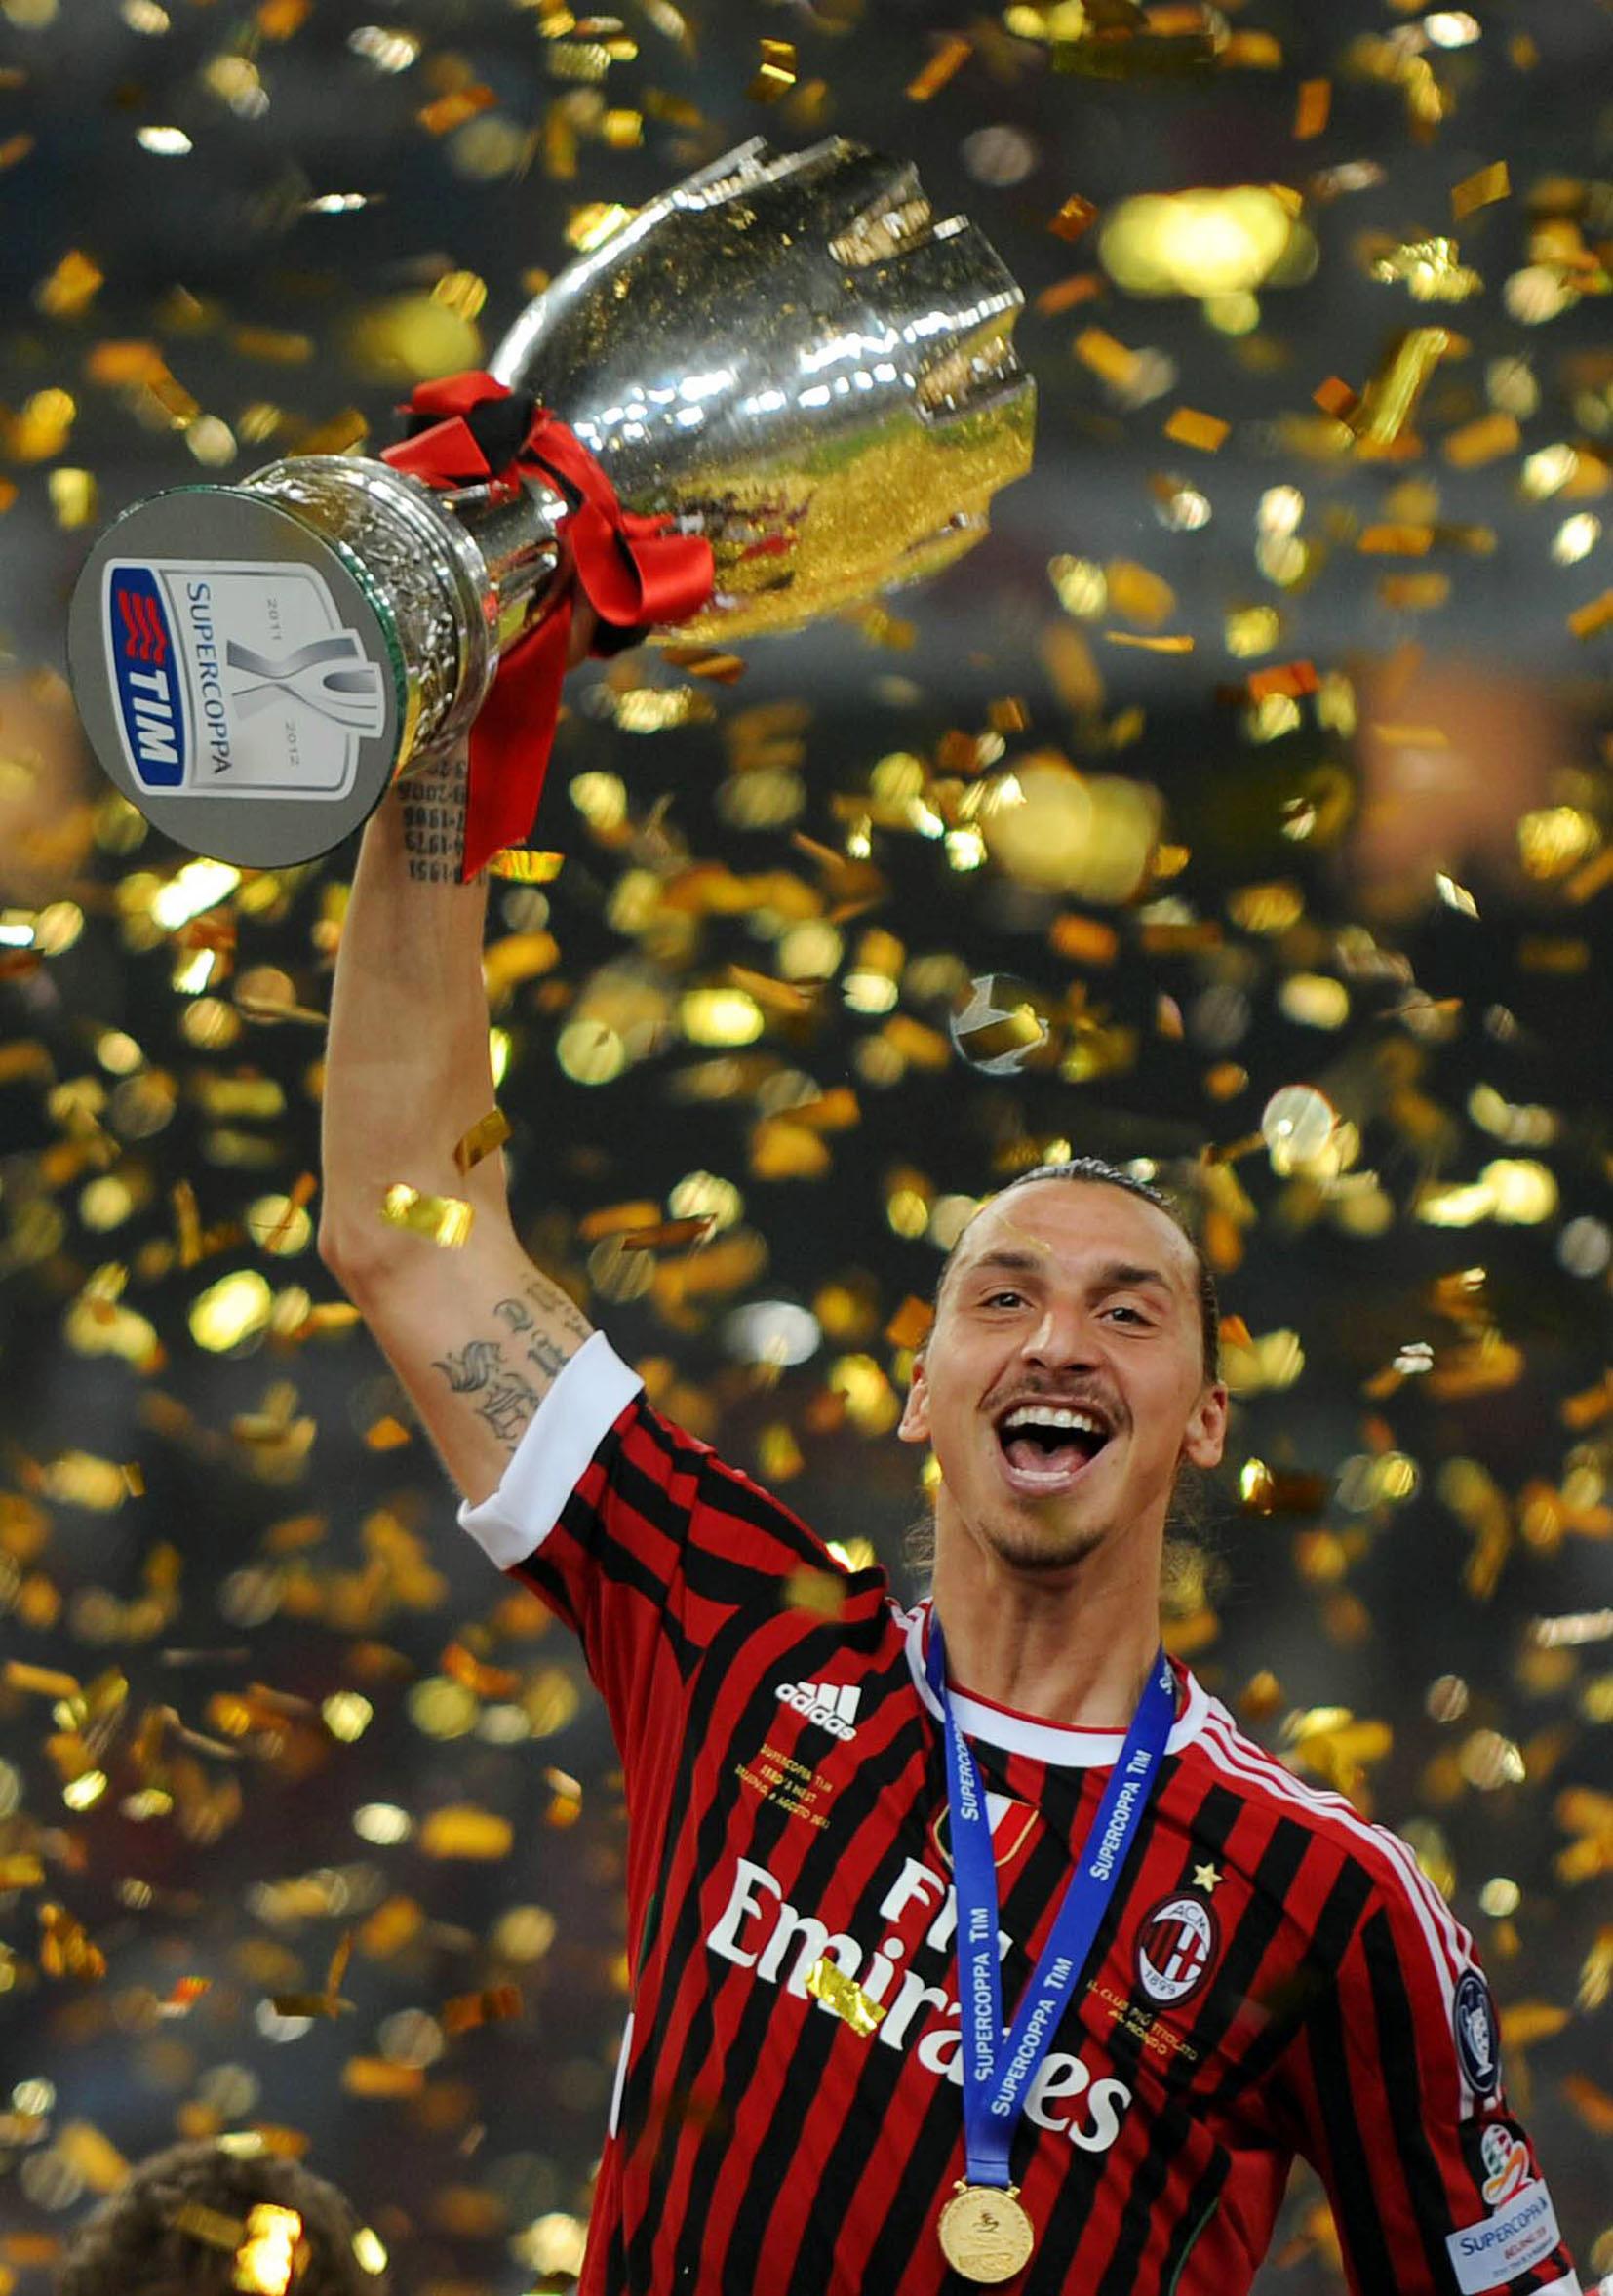 110806 Fotboll, Italiensk Supercup, Milan - Inter: Zlatan Ibrahimovic, Milan (Jubel, Pokal) © BildbyrŒn - cop 75 SWEDEN ONLY